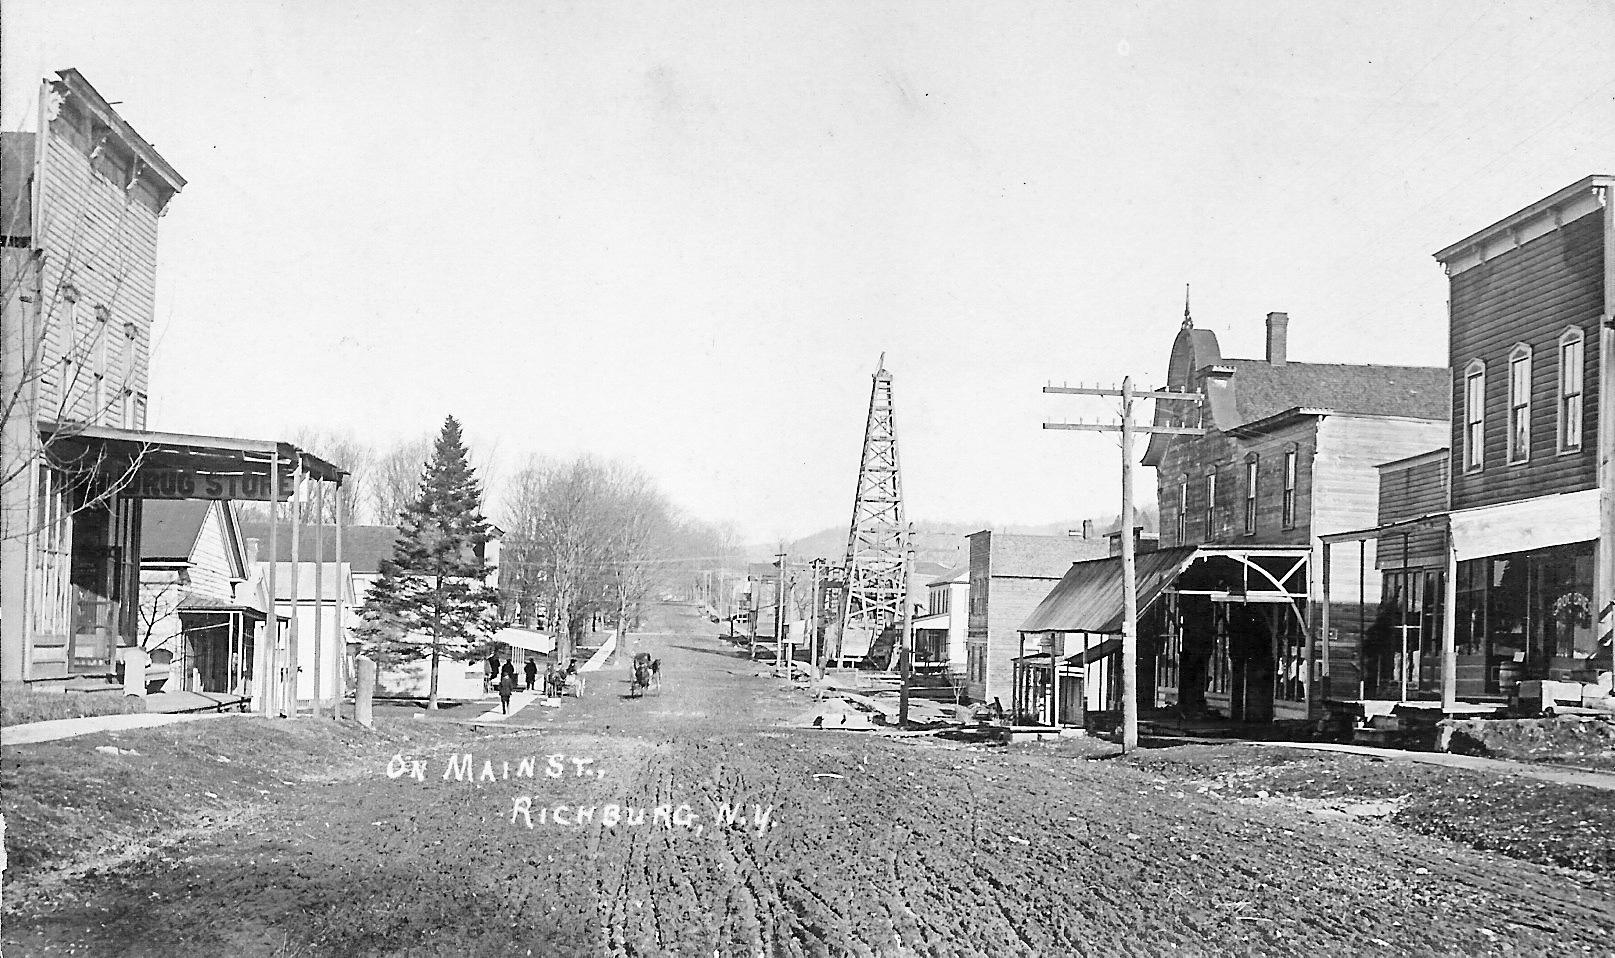 Richburg on Main Street circa 1900